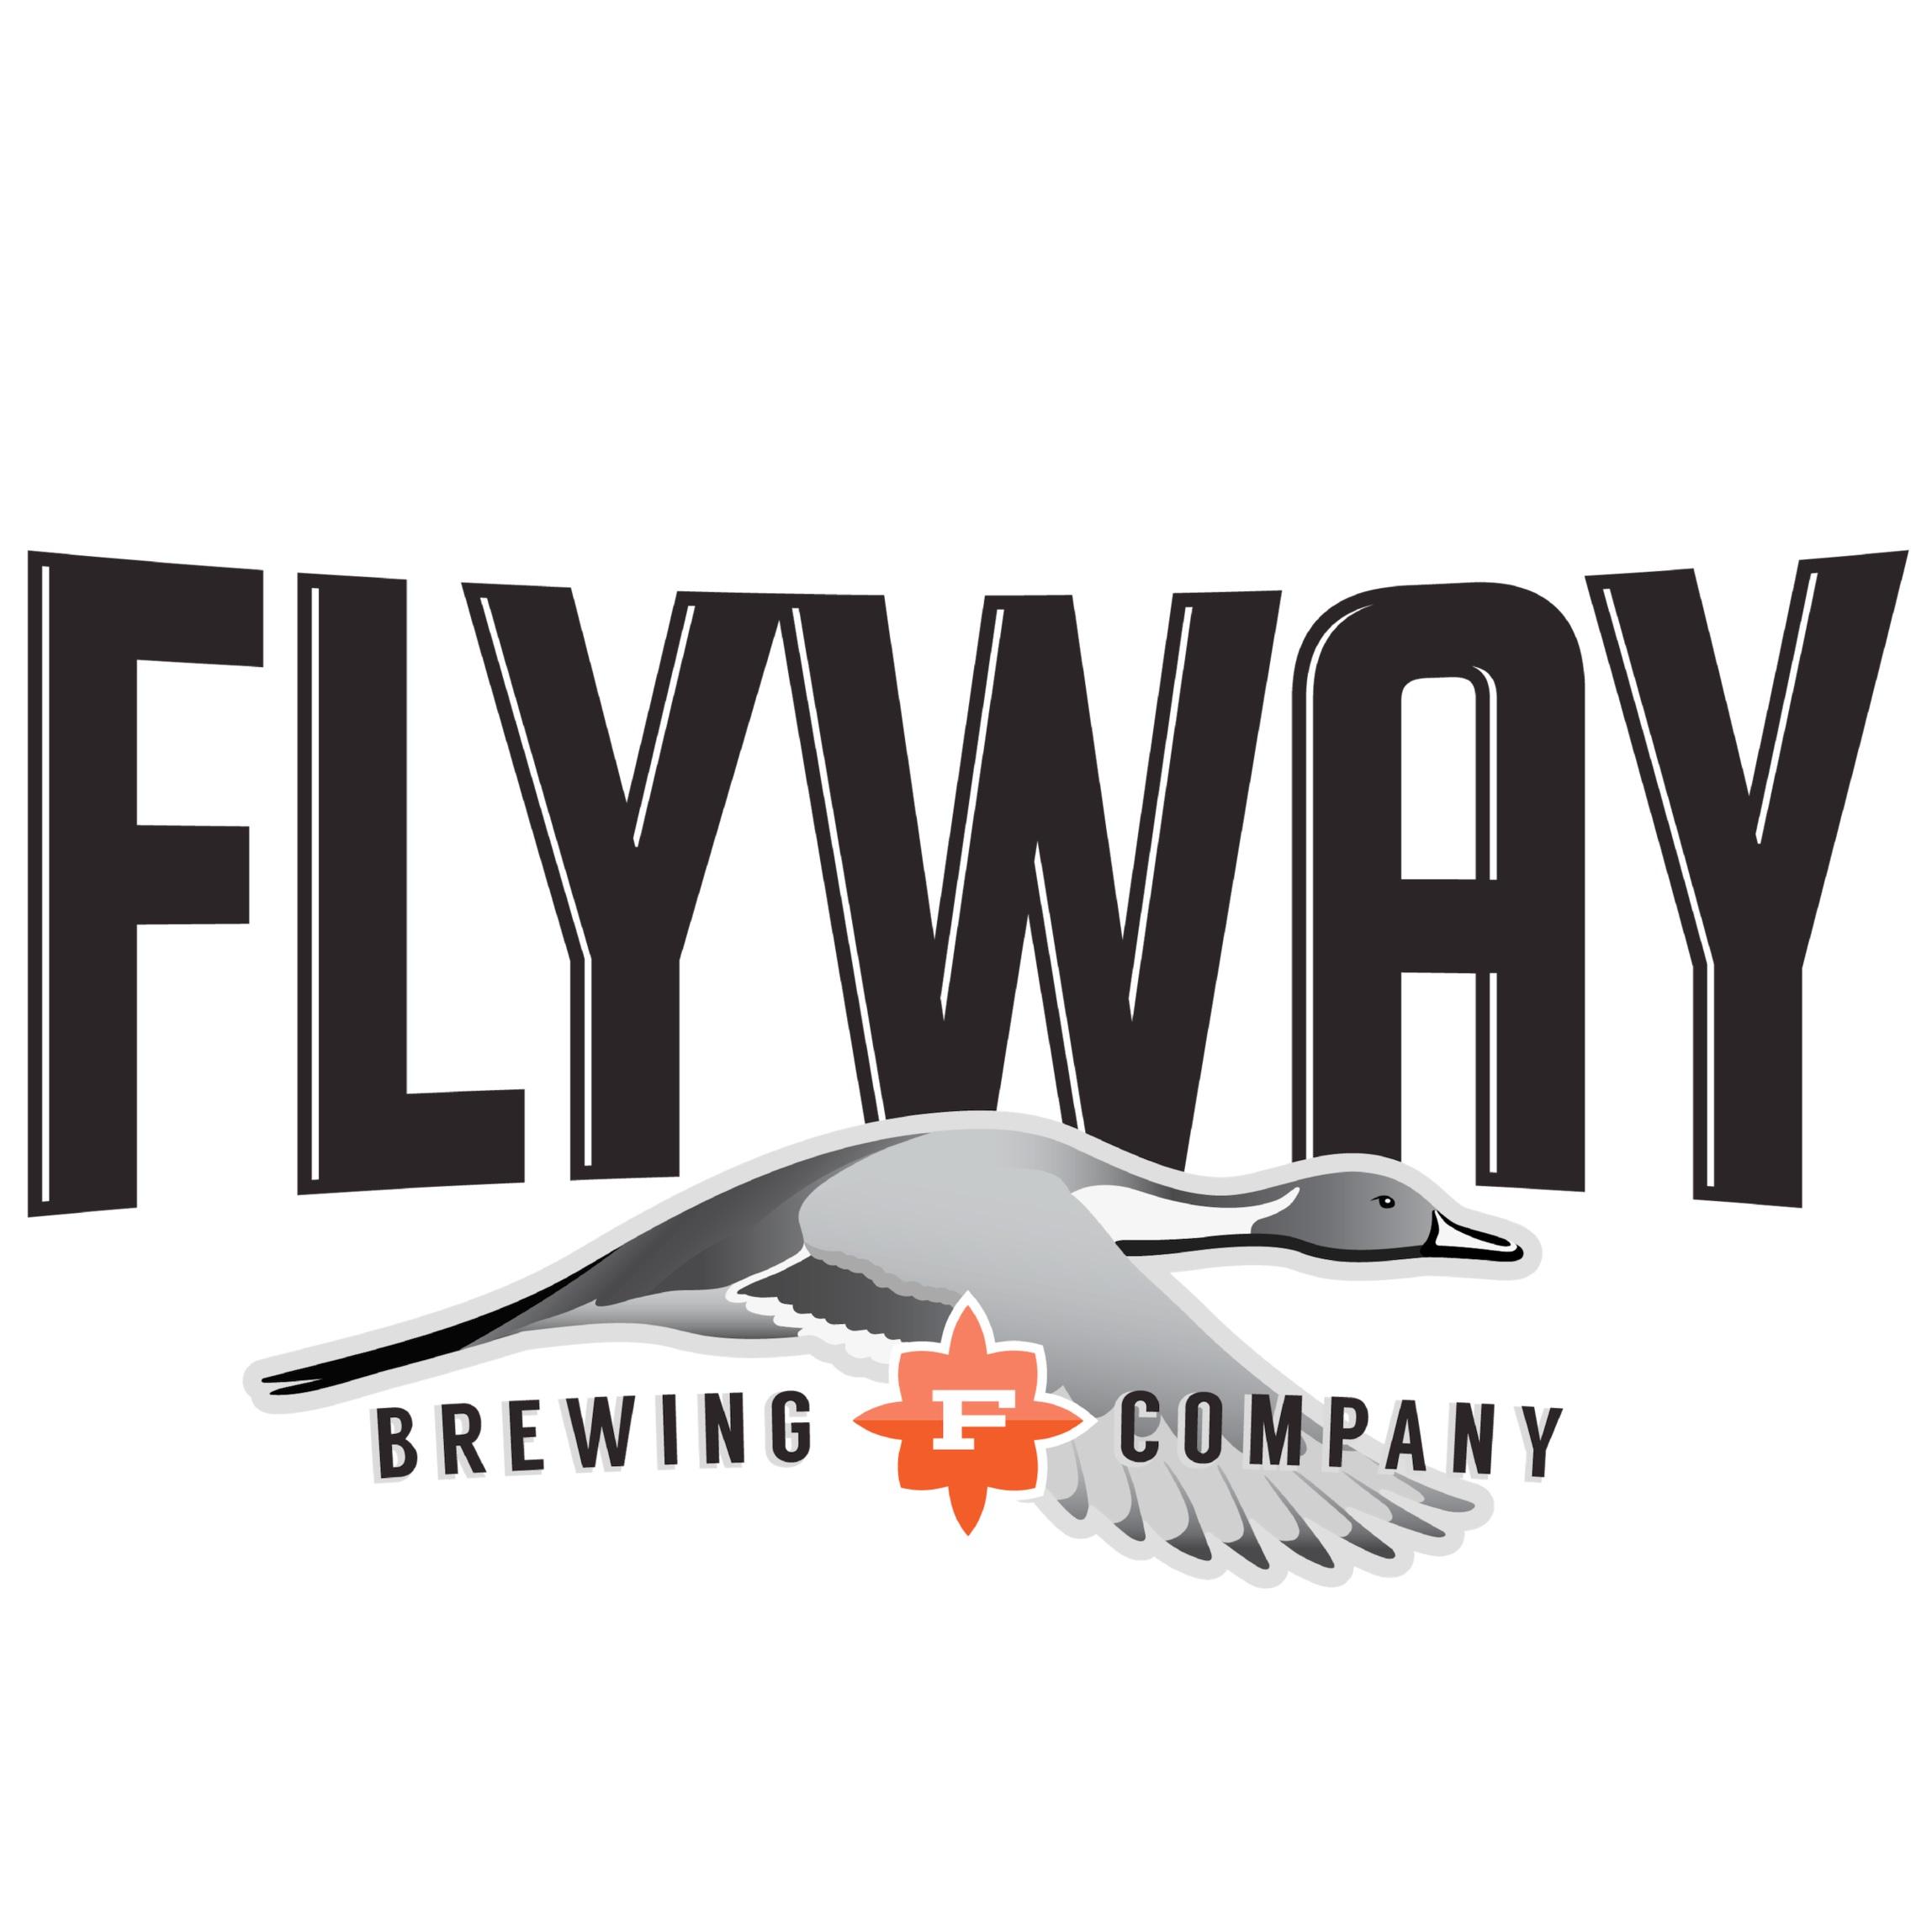 Flyway_Brewing_North_Little_Rock_Arkansas_Craft_Brewery.jpg